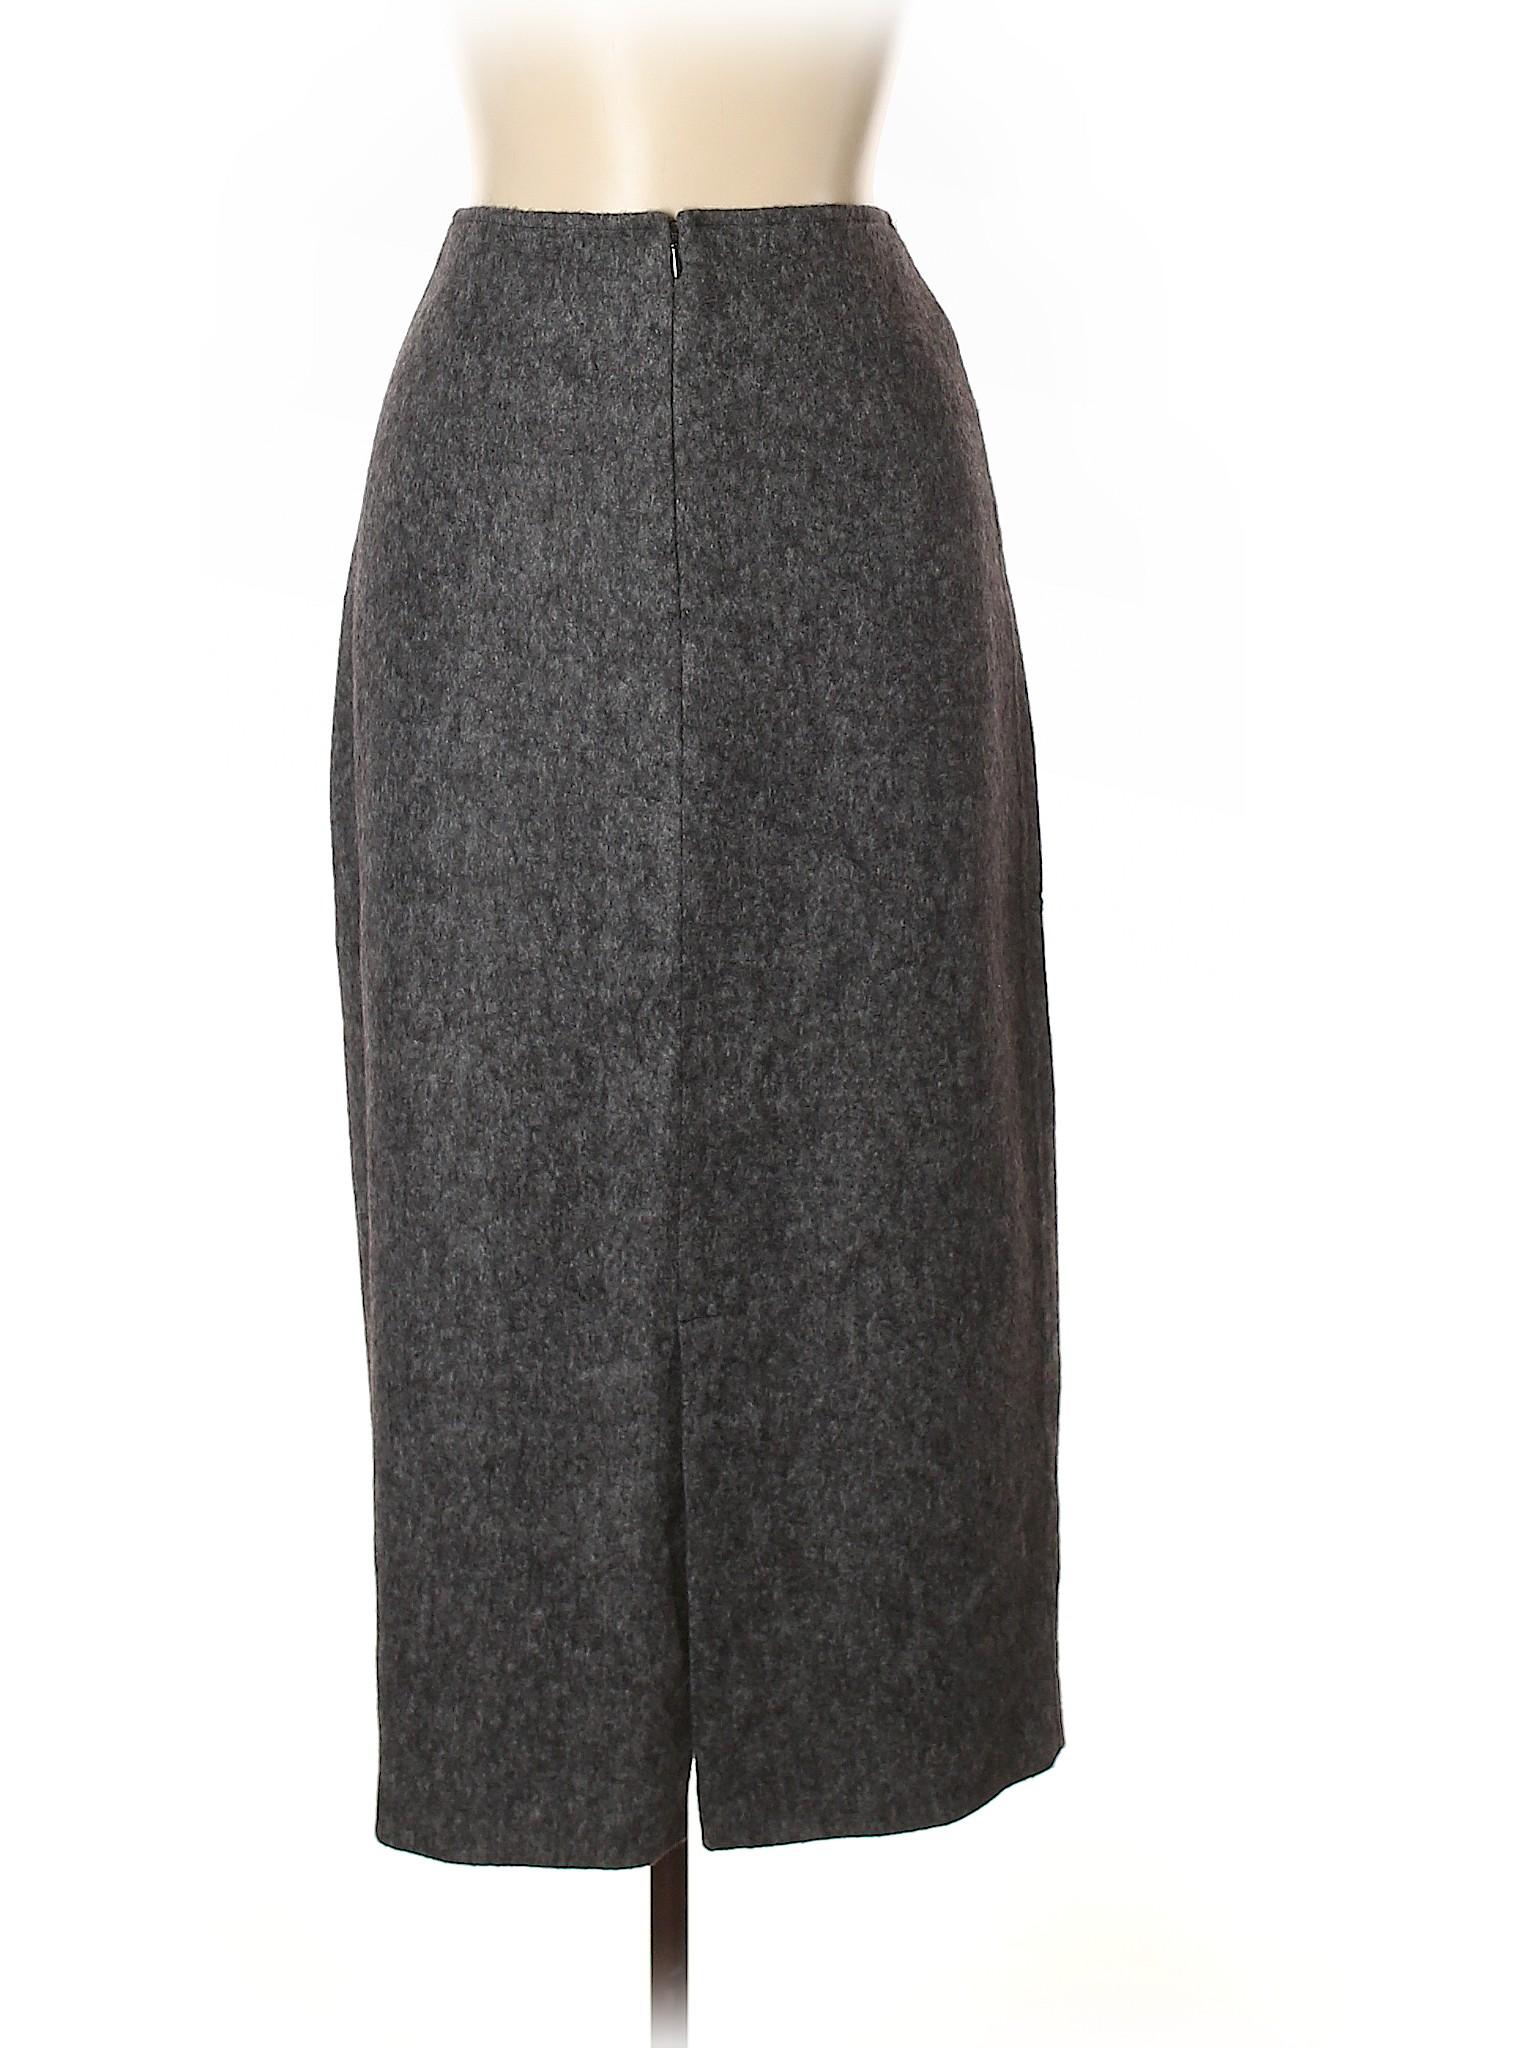 Garcia Skirt Leisure Purificacion winter Wool q446xzEI